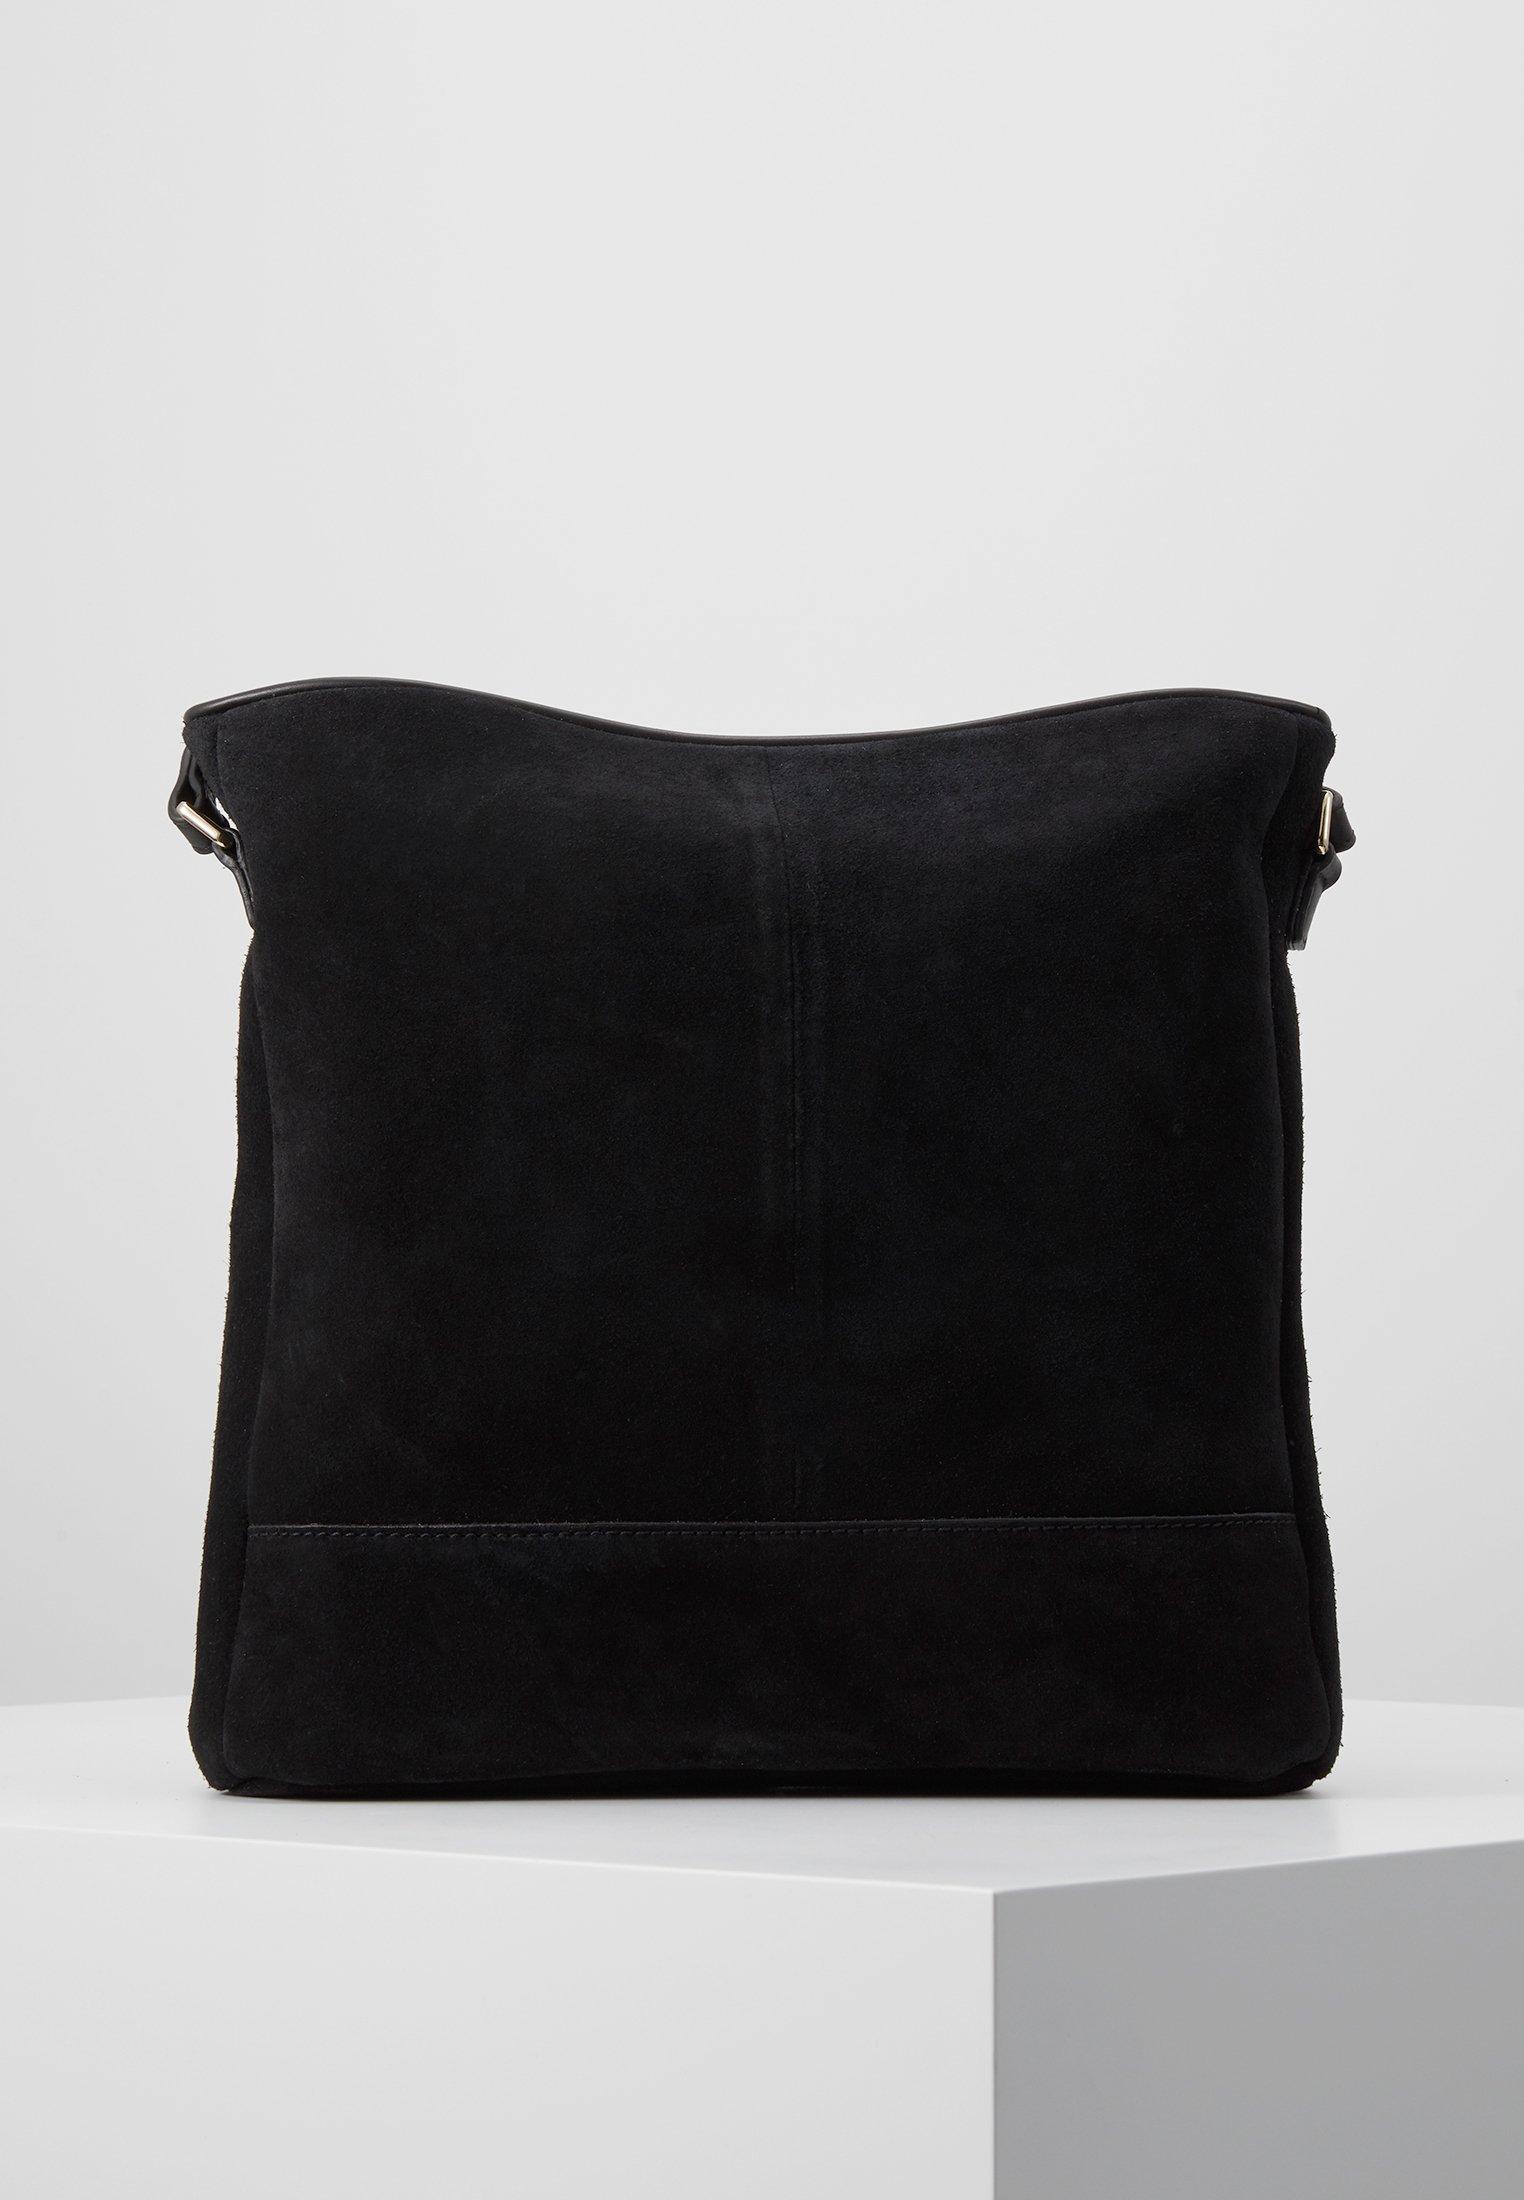 Anna Field LeatherBorsa Tracolla A Black P8n0kwO